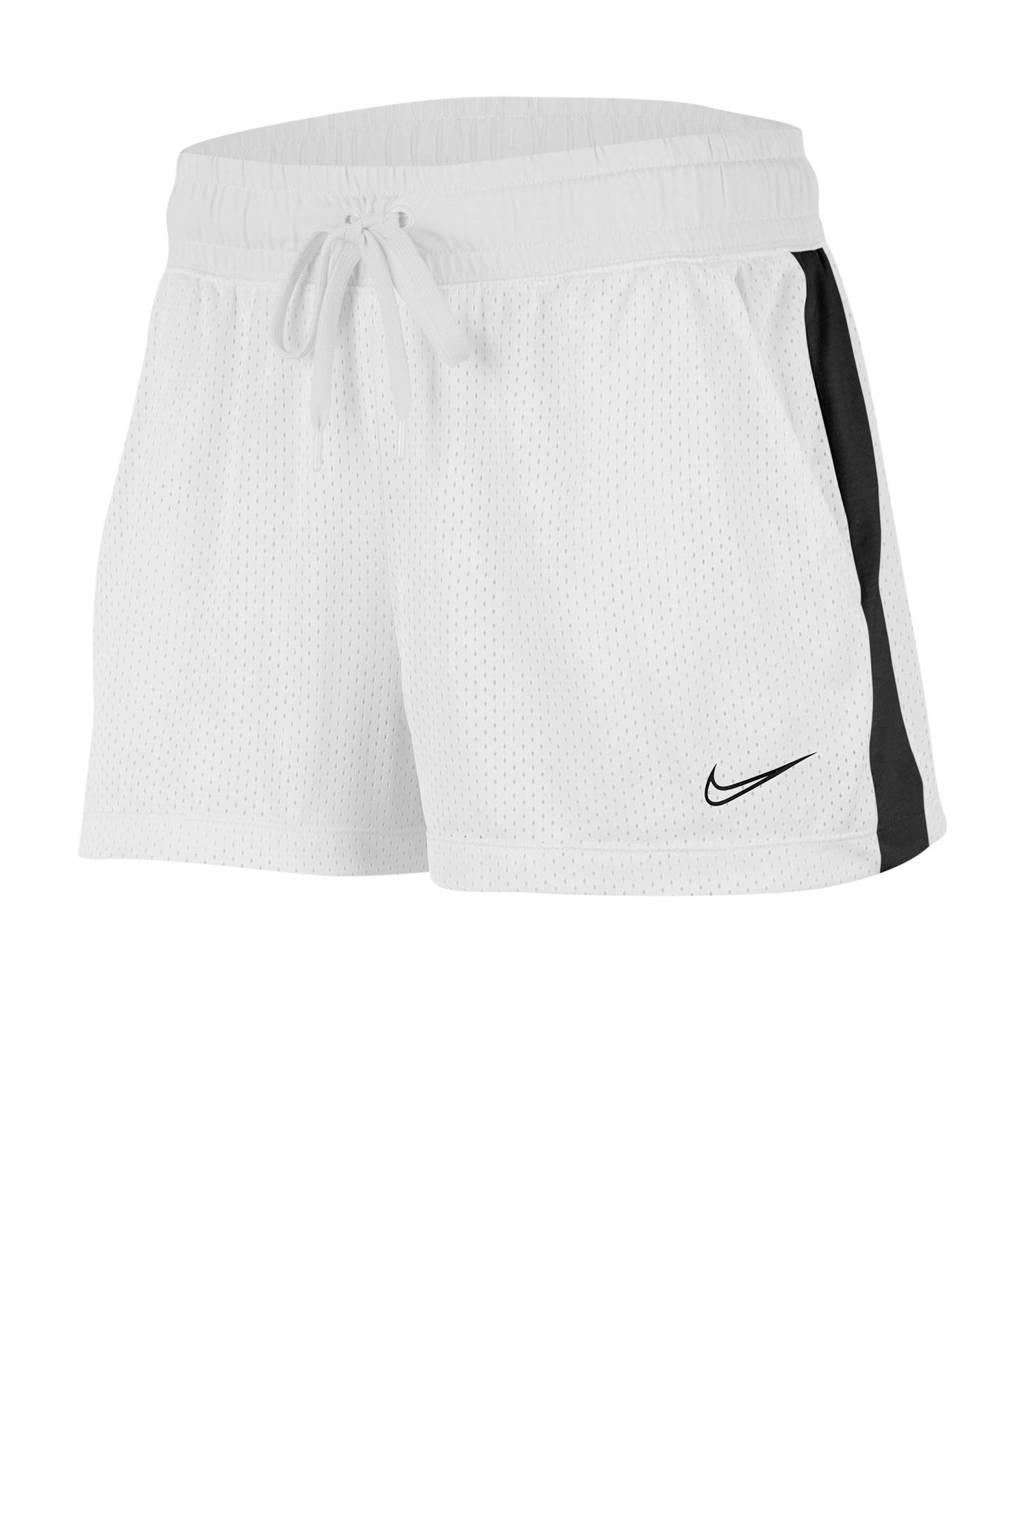 Nike short wit/zwart, Wit/zwart